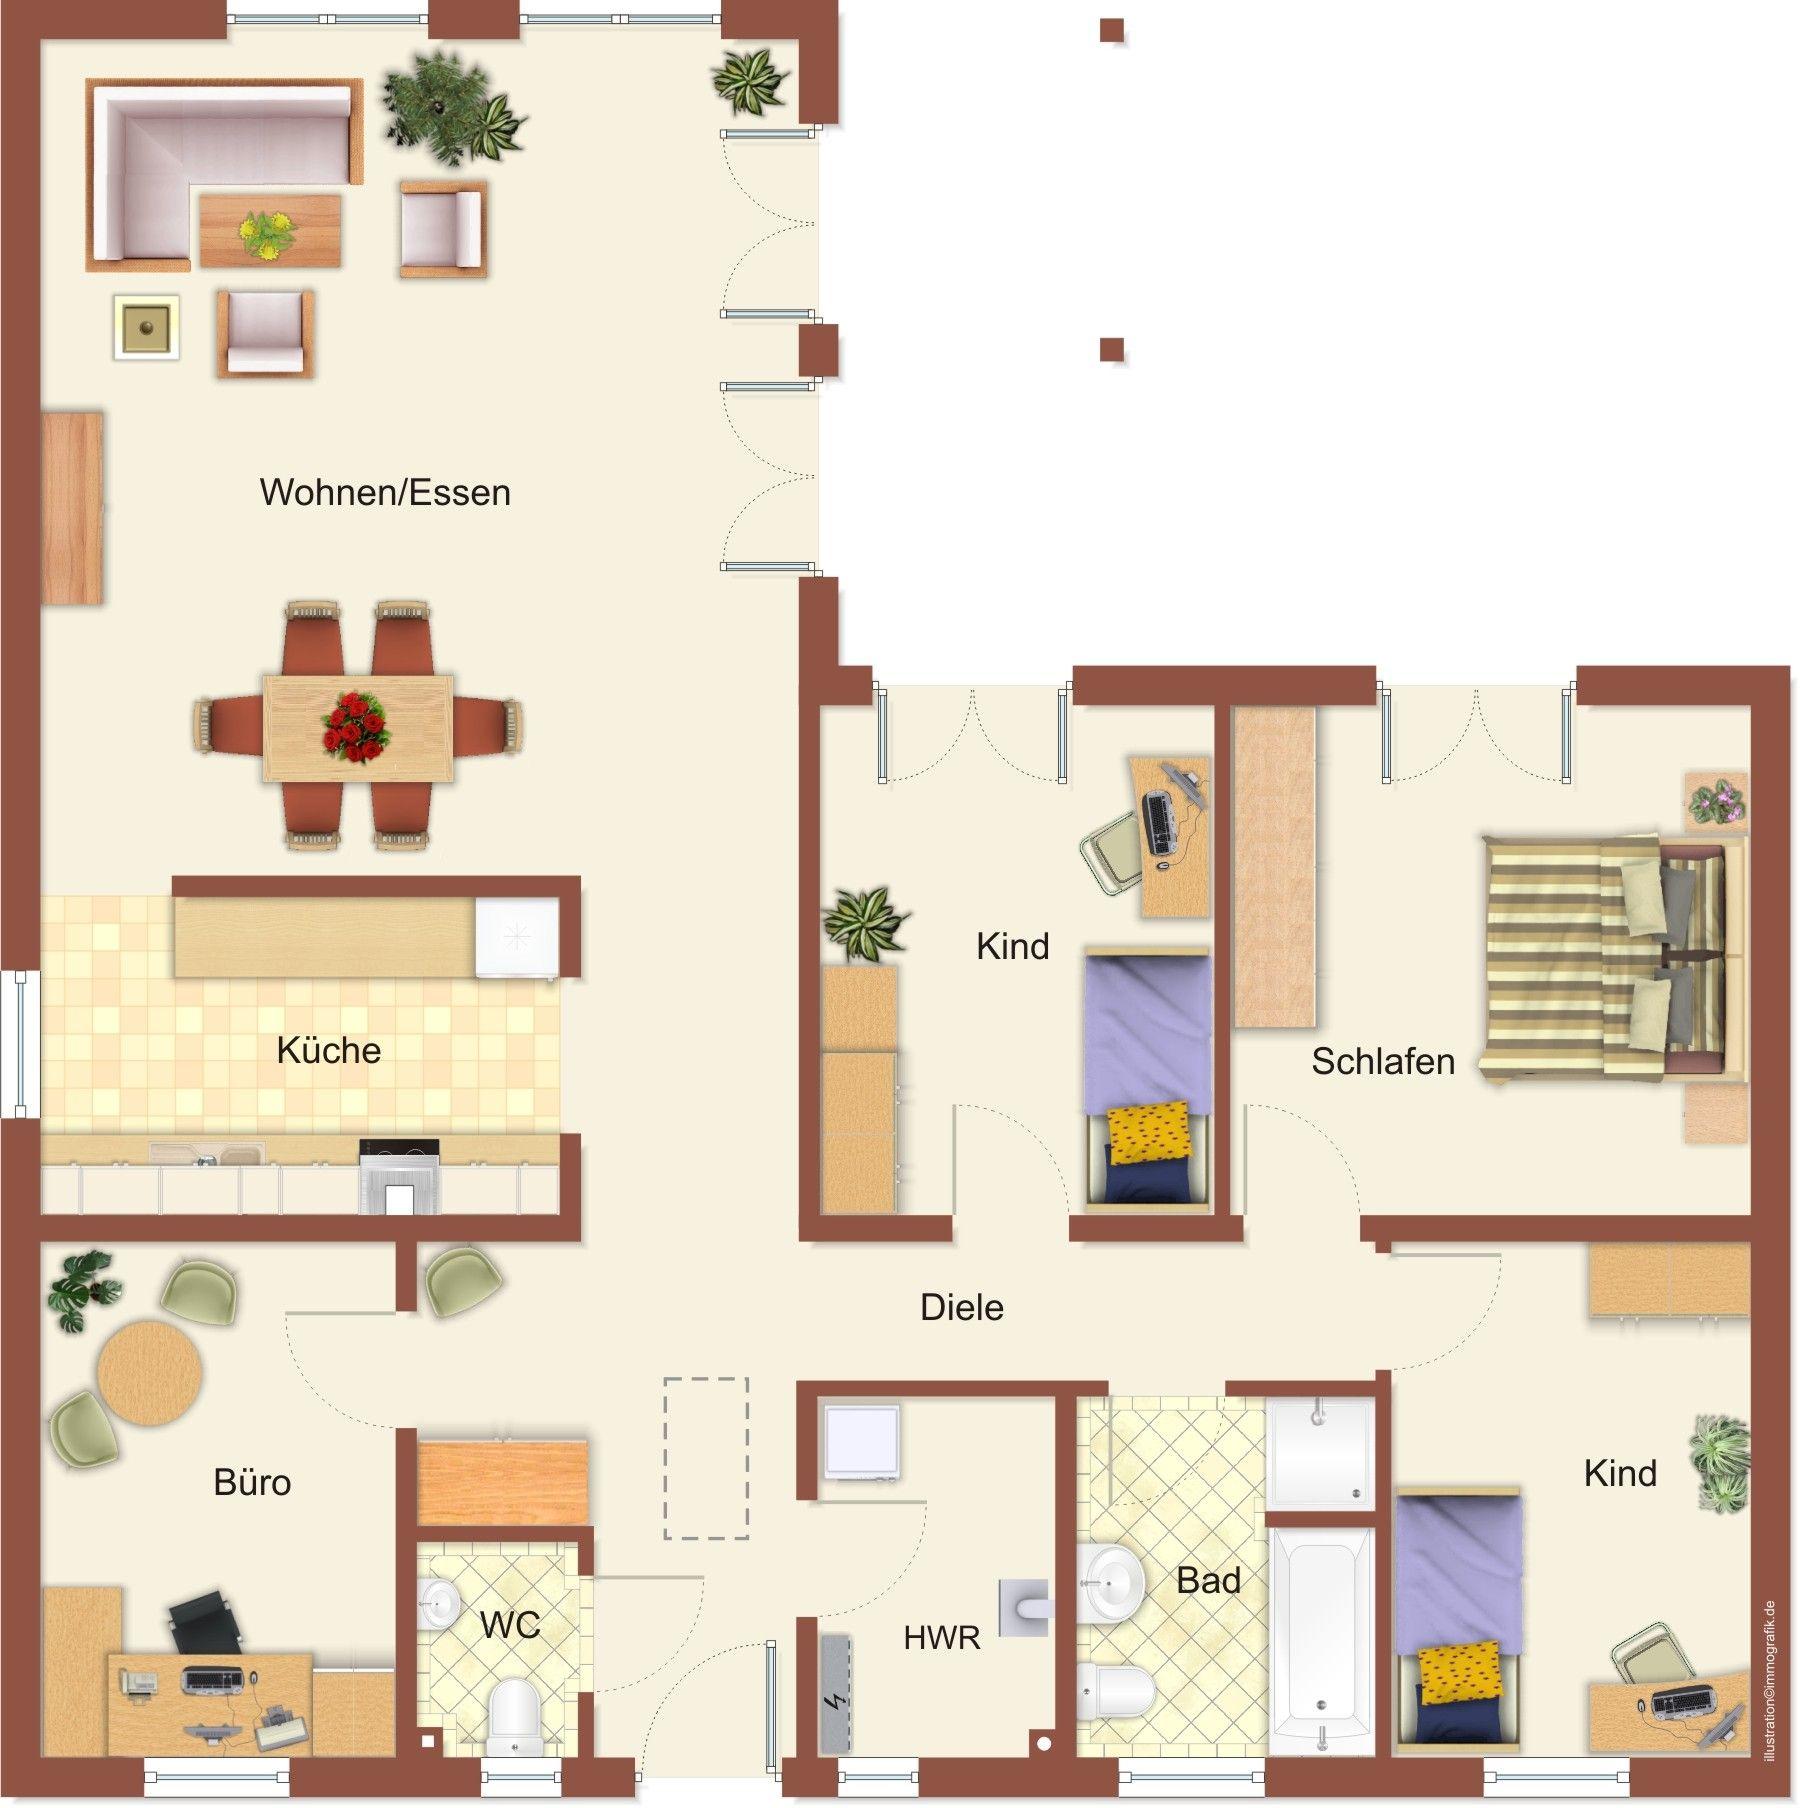 Haus-Bild: Bungalows & Winkelbungalows | Houses | Pinterest ...